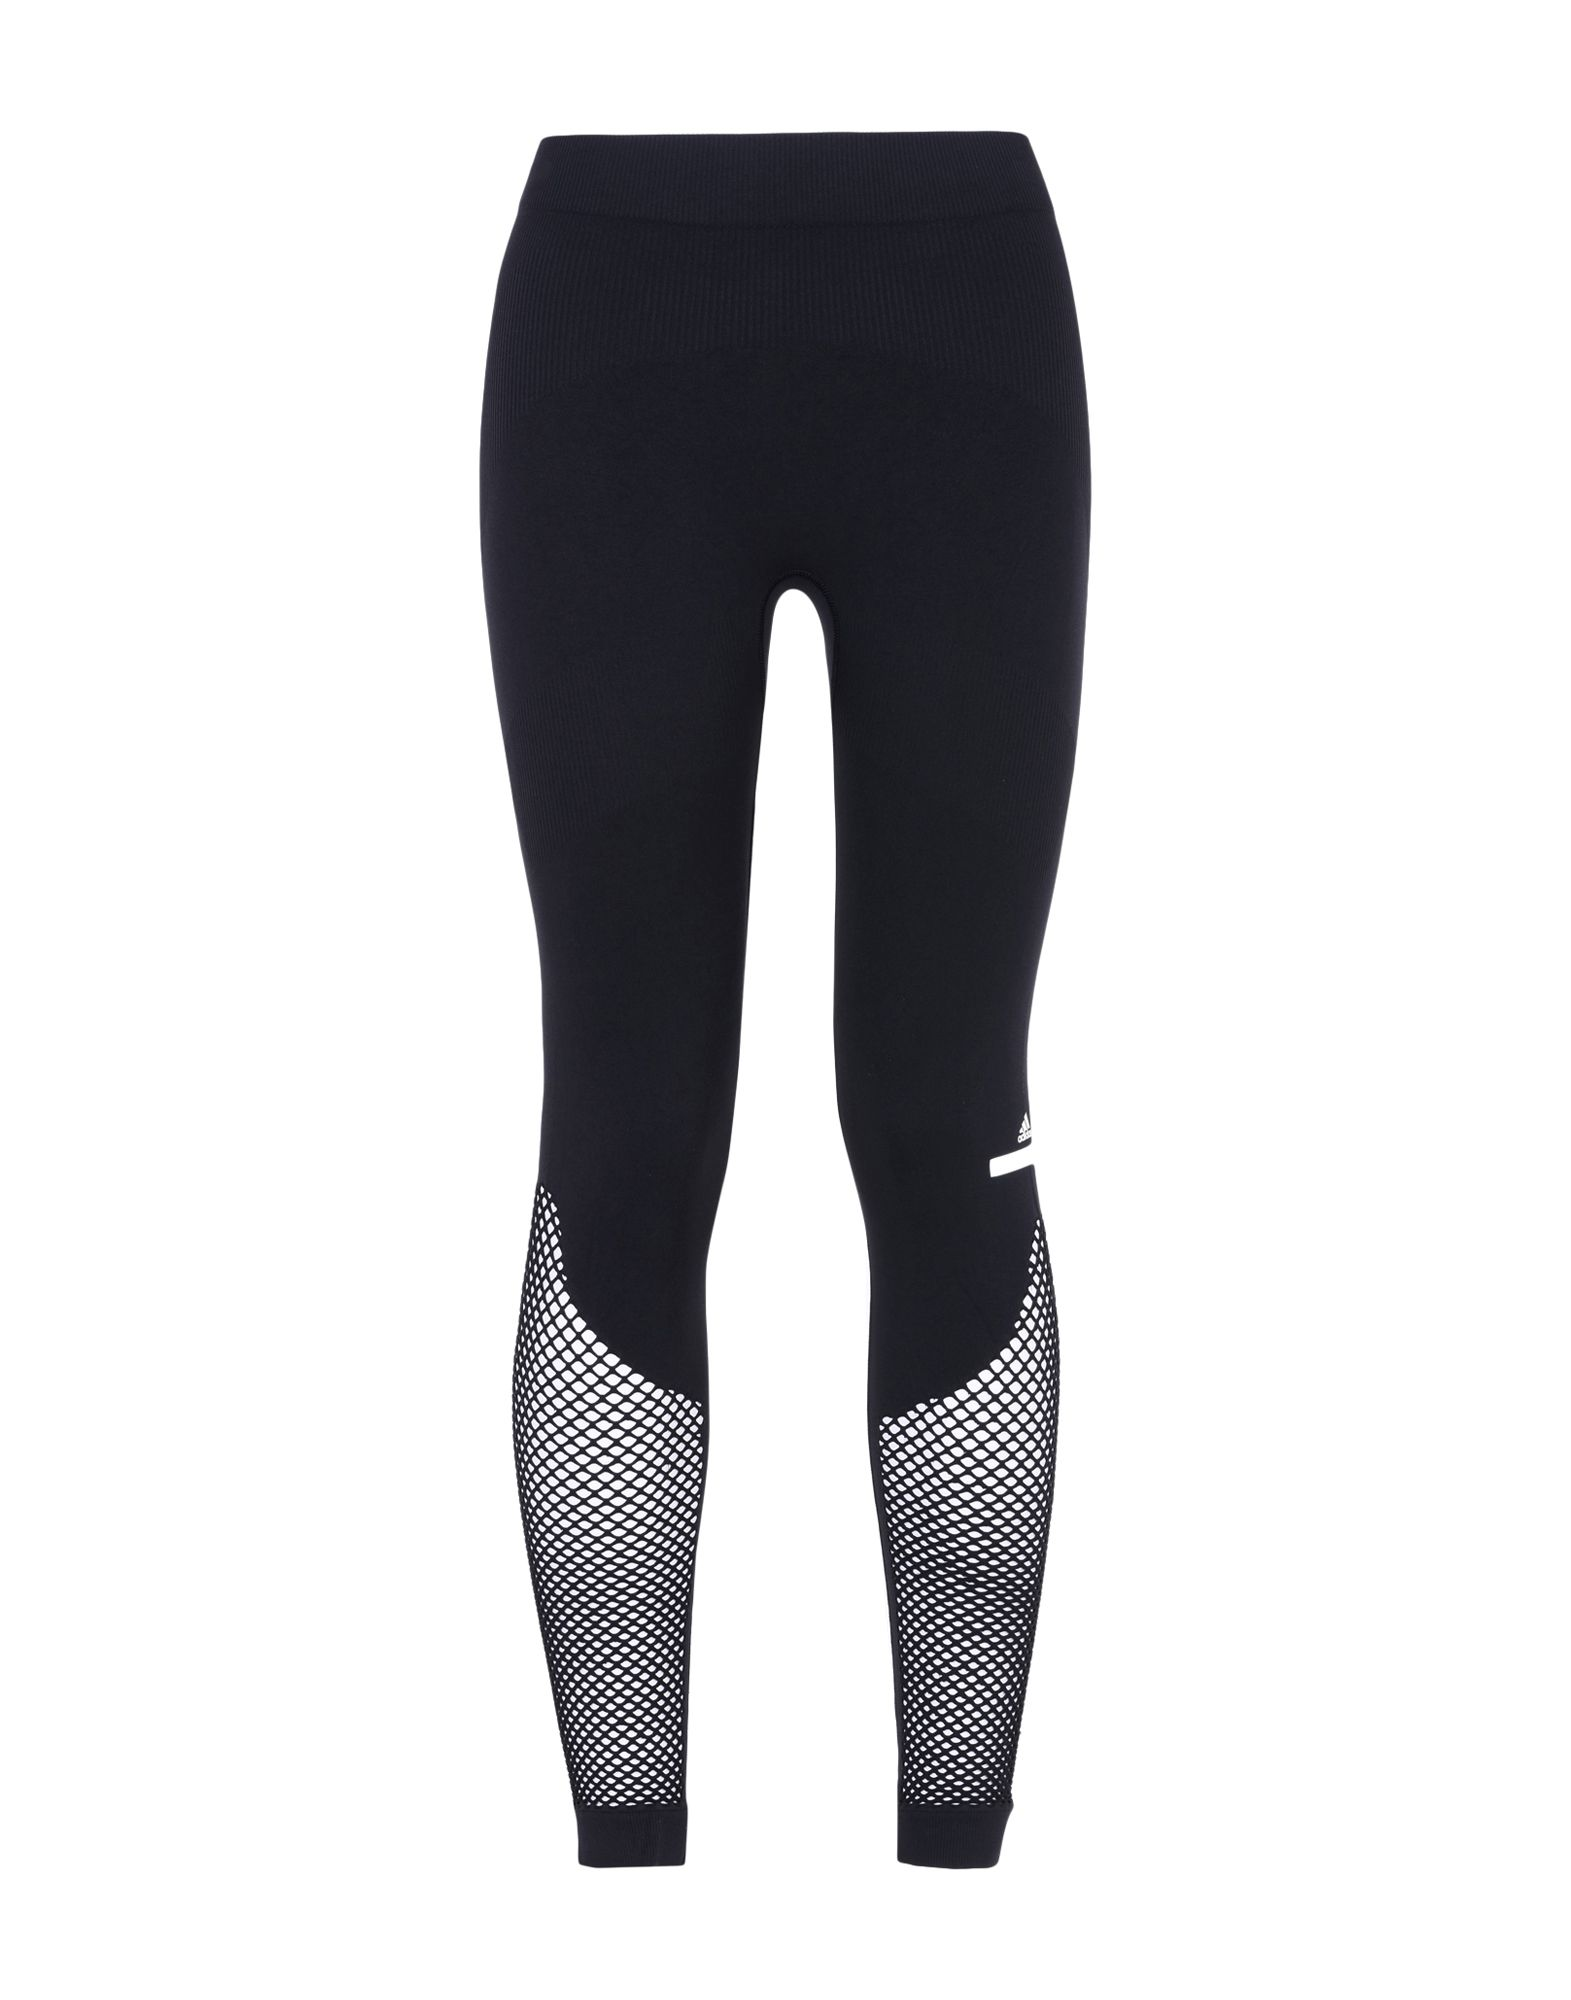 ADIDAS by STELLA McCARTNEY Легинсы воланы для бадминтона adidas d training 79 перо быстрая скорость